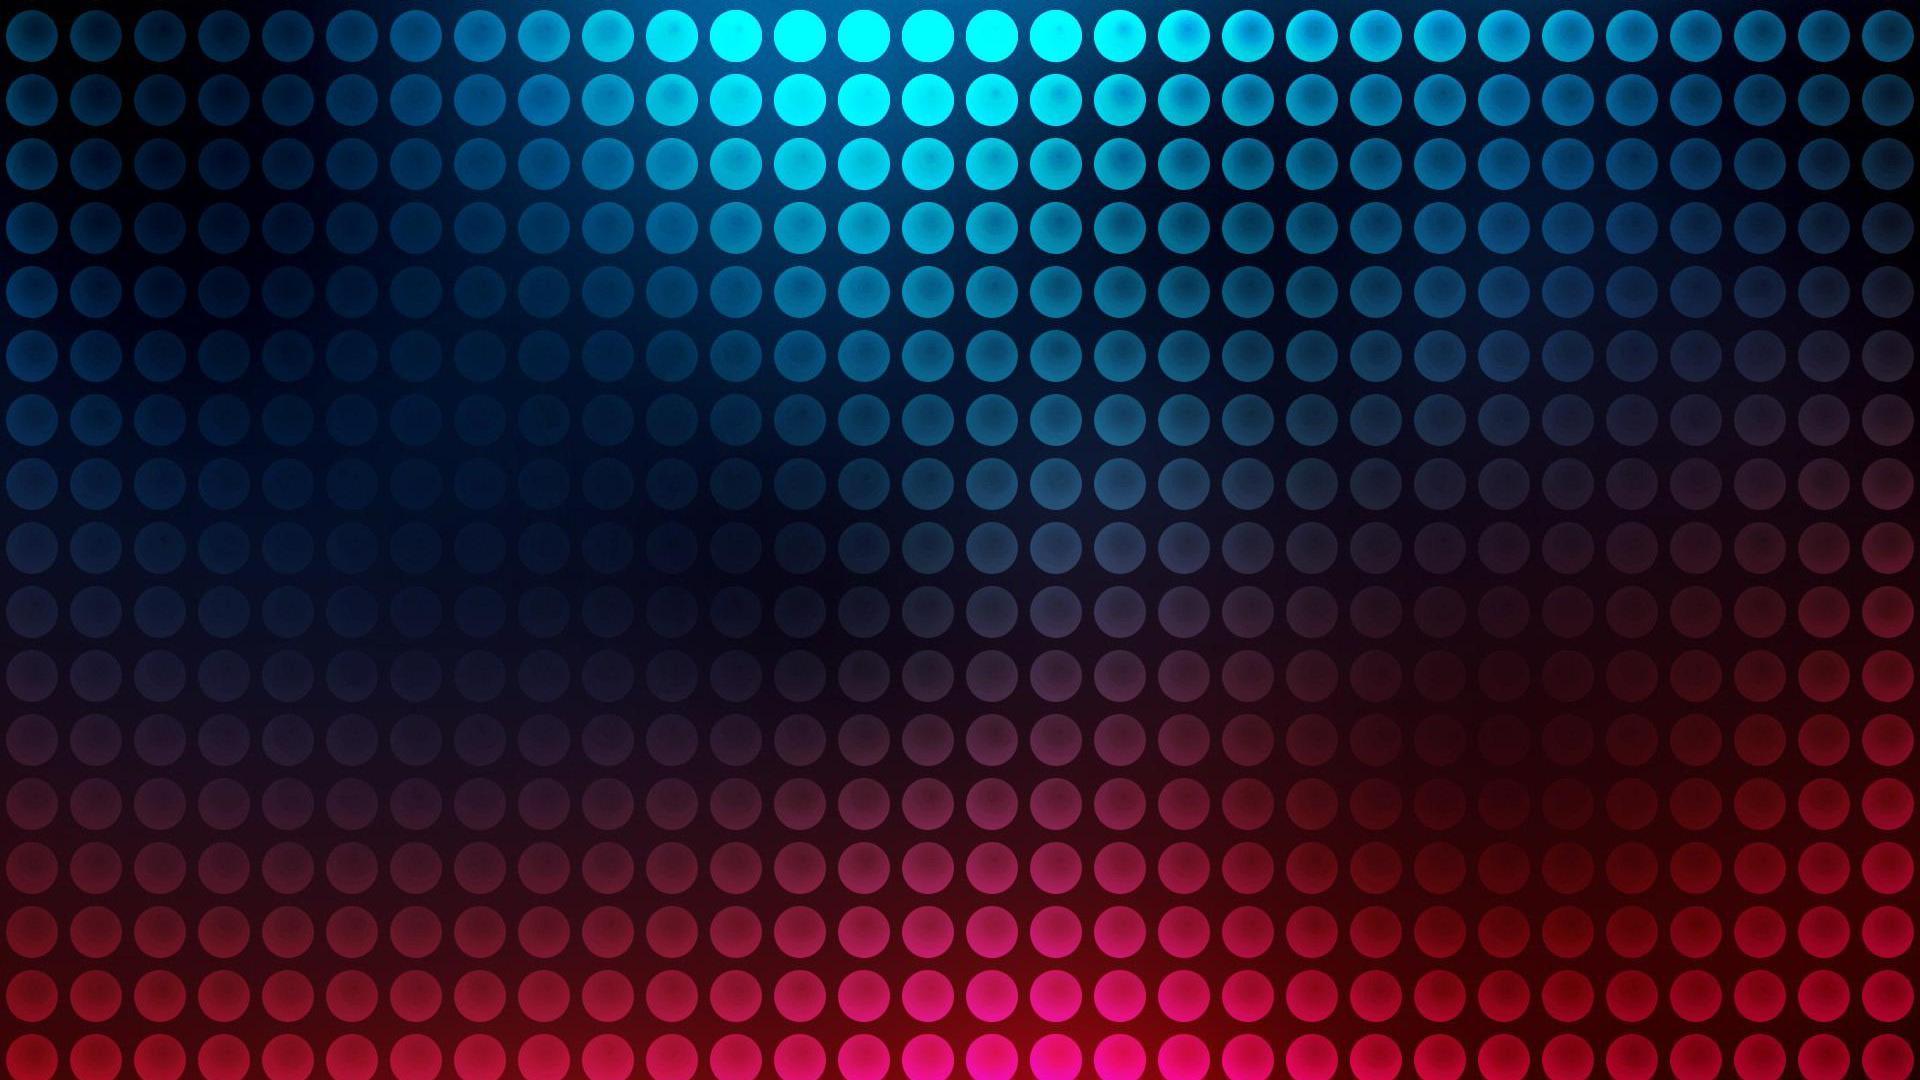 Pattern full hd wallpaper - SF Wallpaper